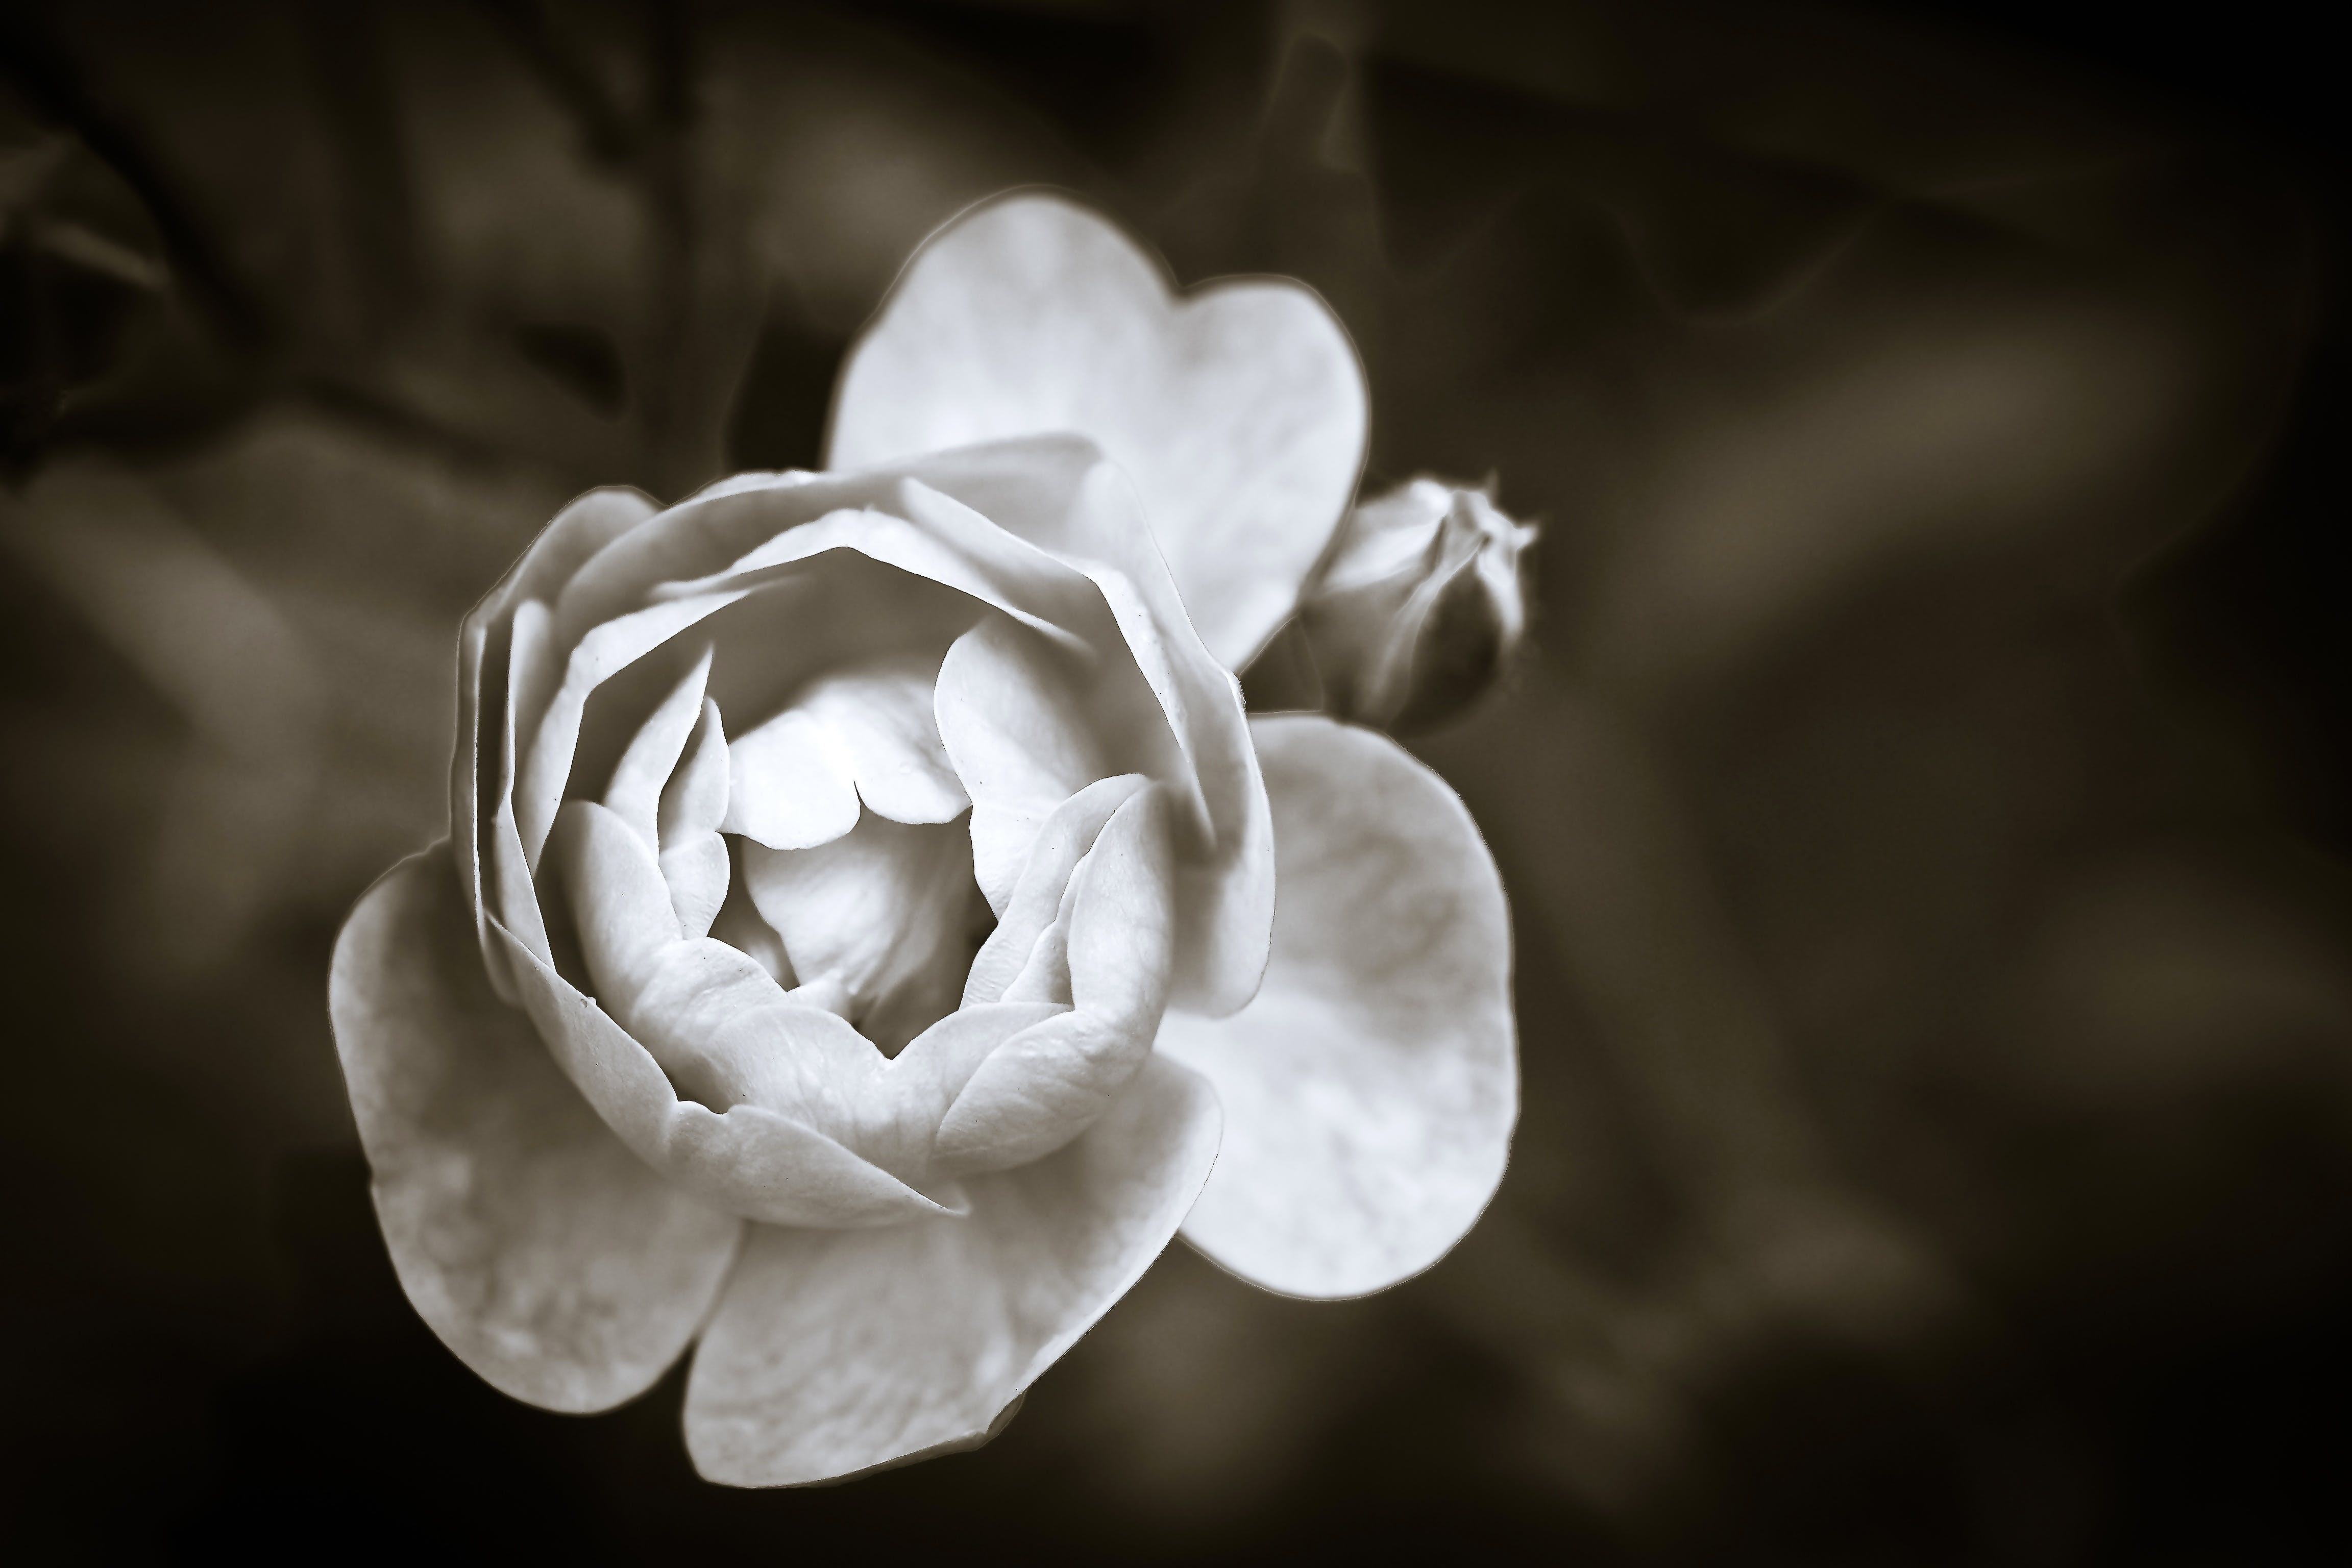 Free stock photo of black and white romantic petals plant